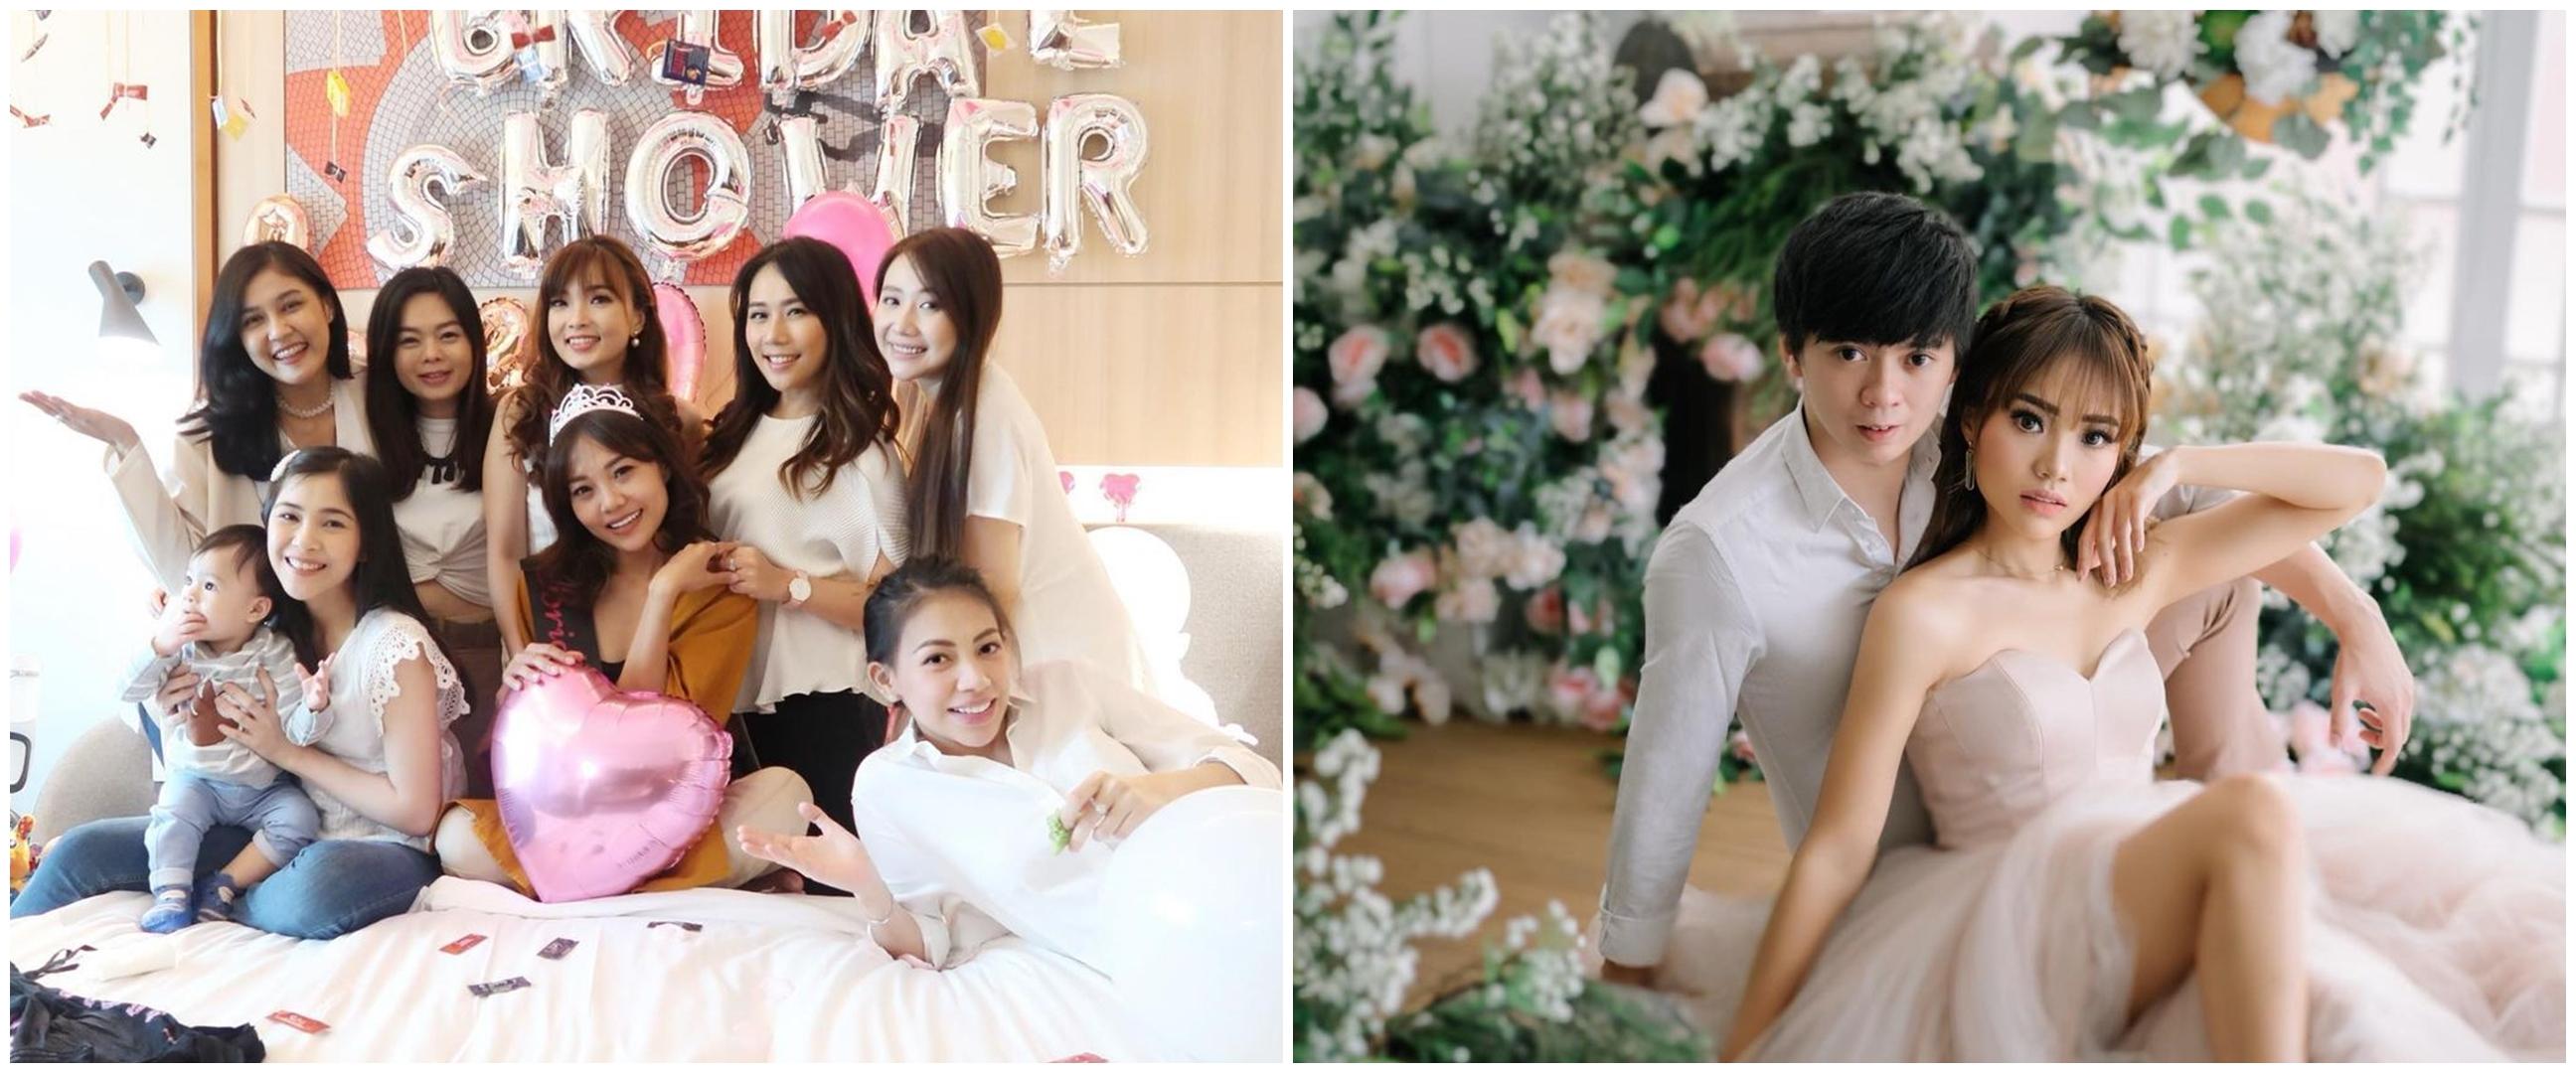 10 Momen bridal shower Steffy, dapat kejutan dari personel Cherrybelle